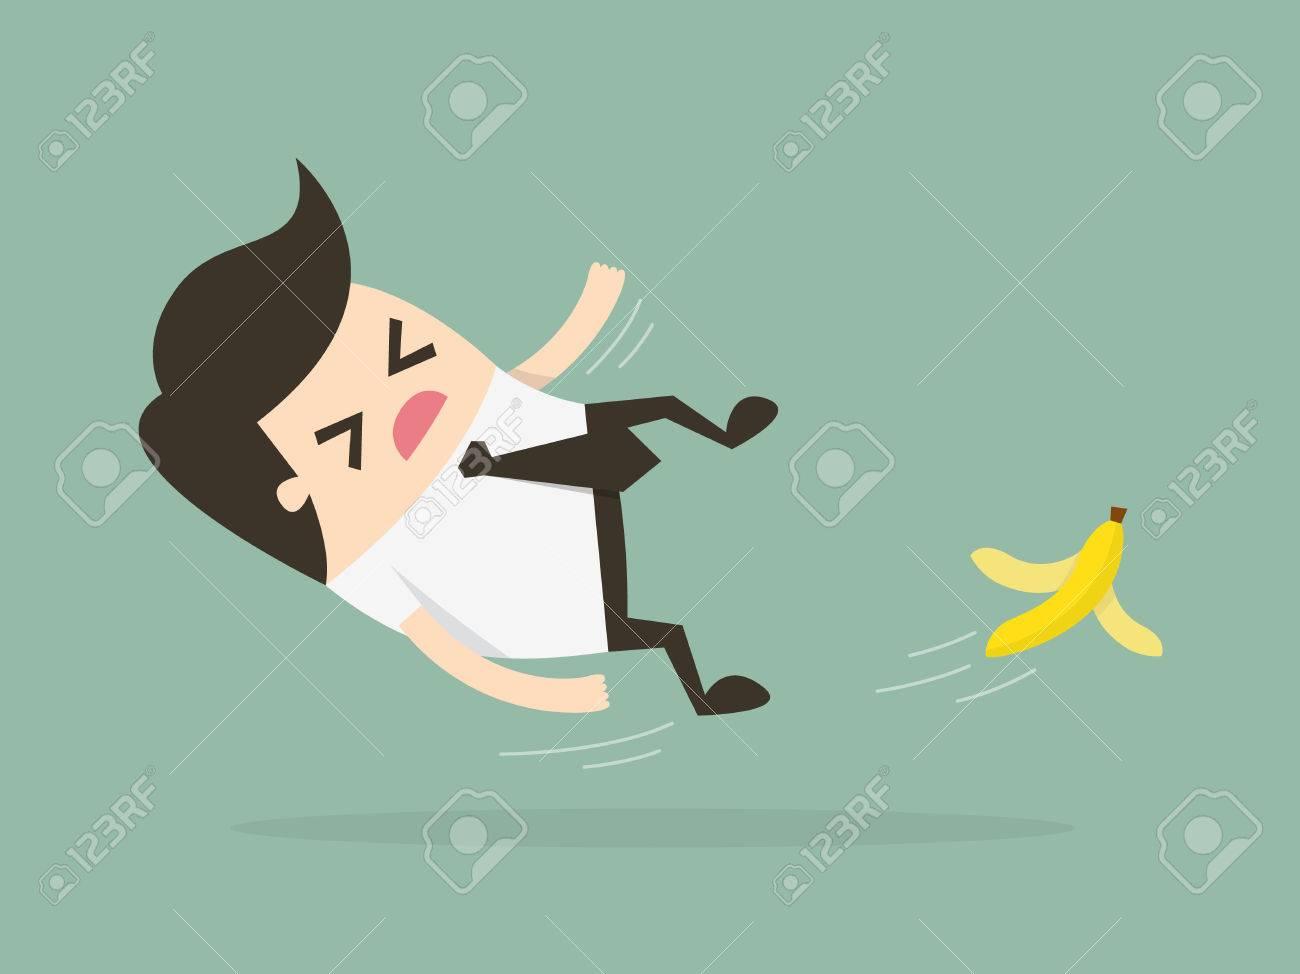 Businessman slipping on a banana peel. Business concept illustration. - 54429689